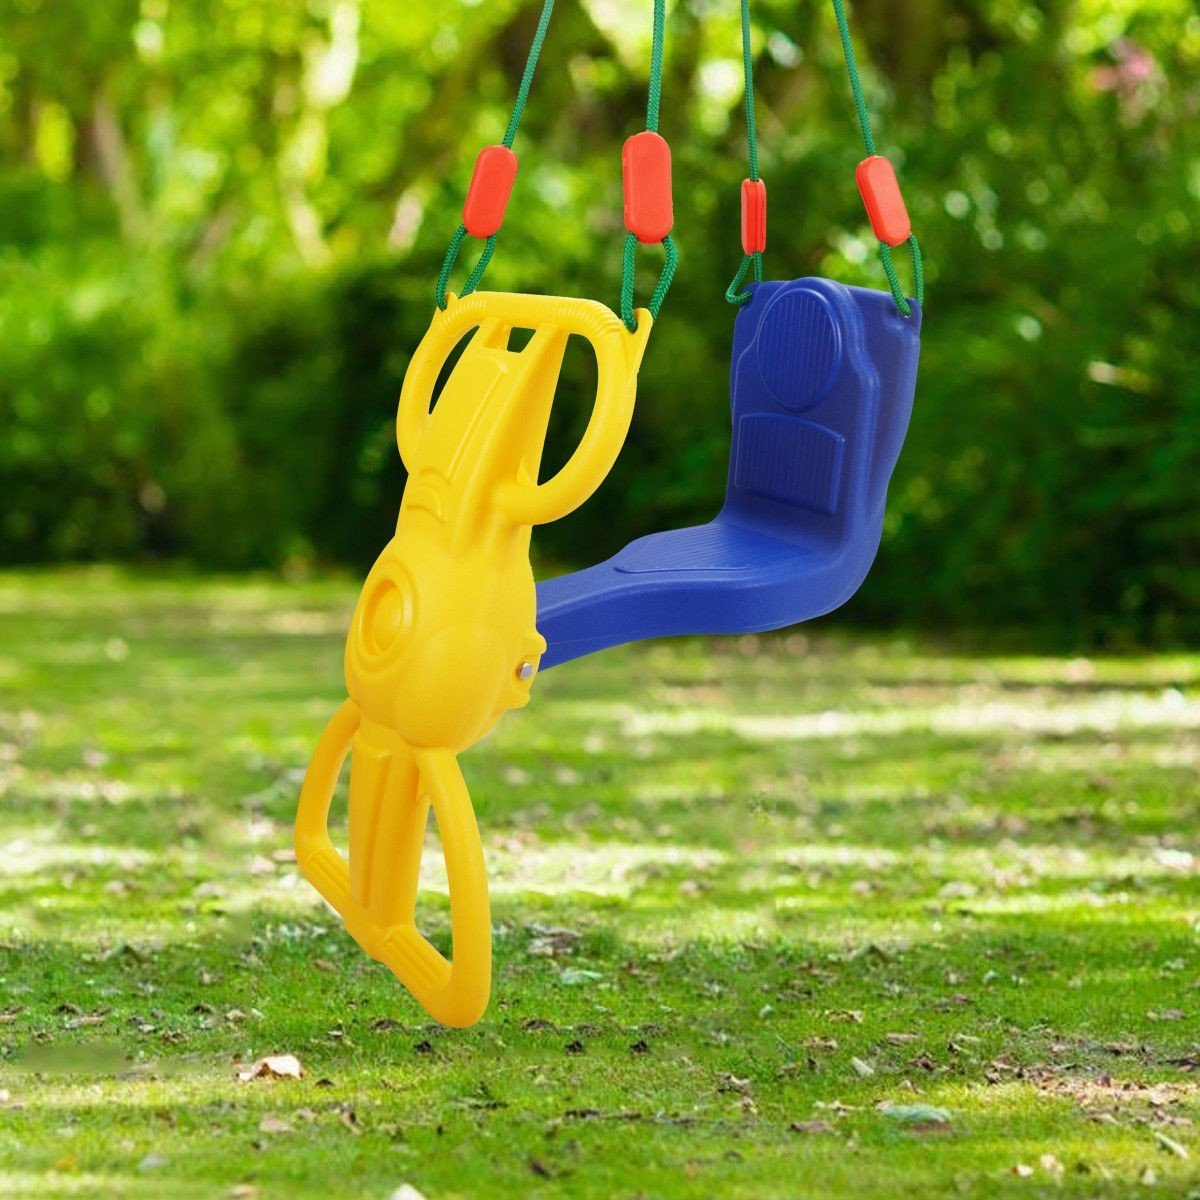 Backyard Kids Rider Glider Swing with Hangers by Apontus (Image #2)